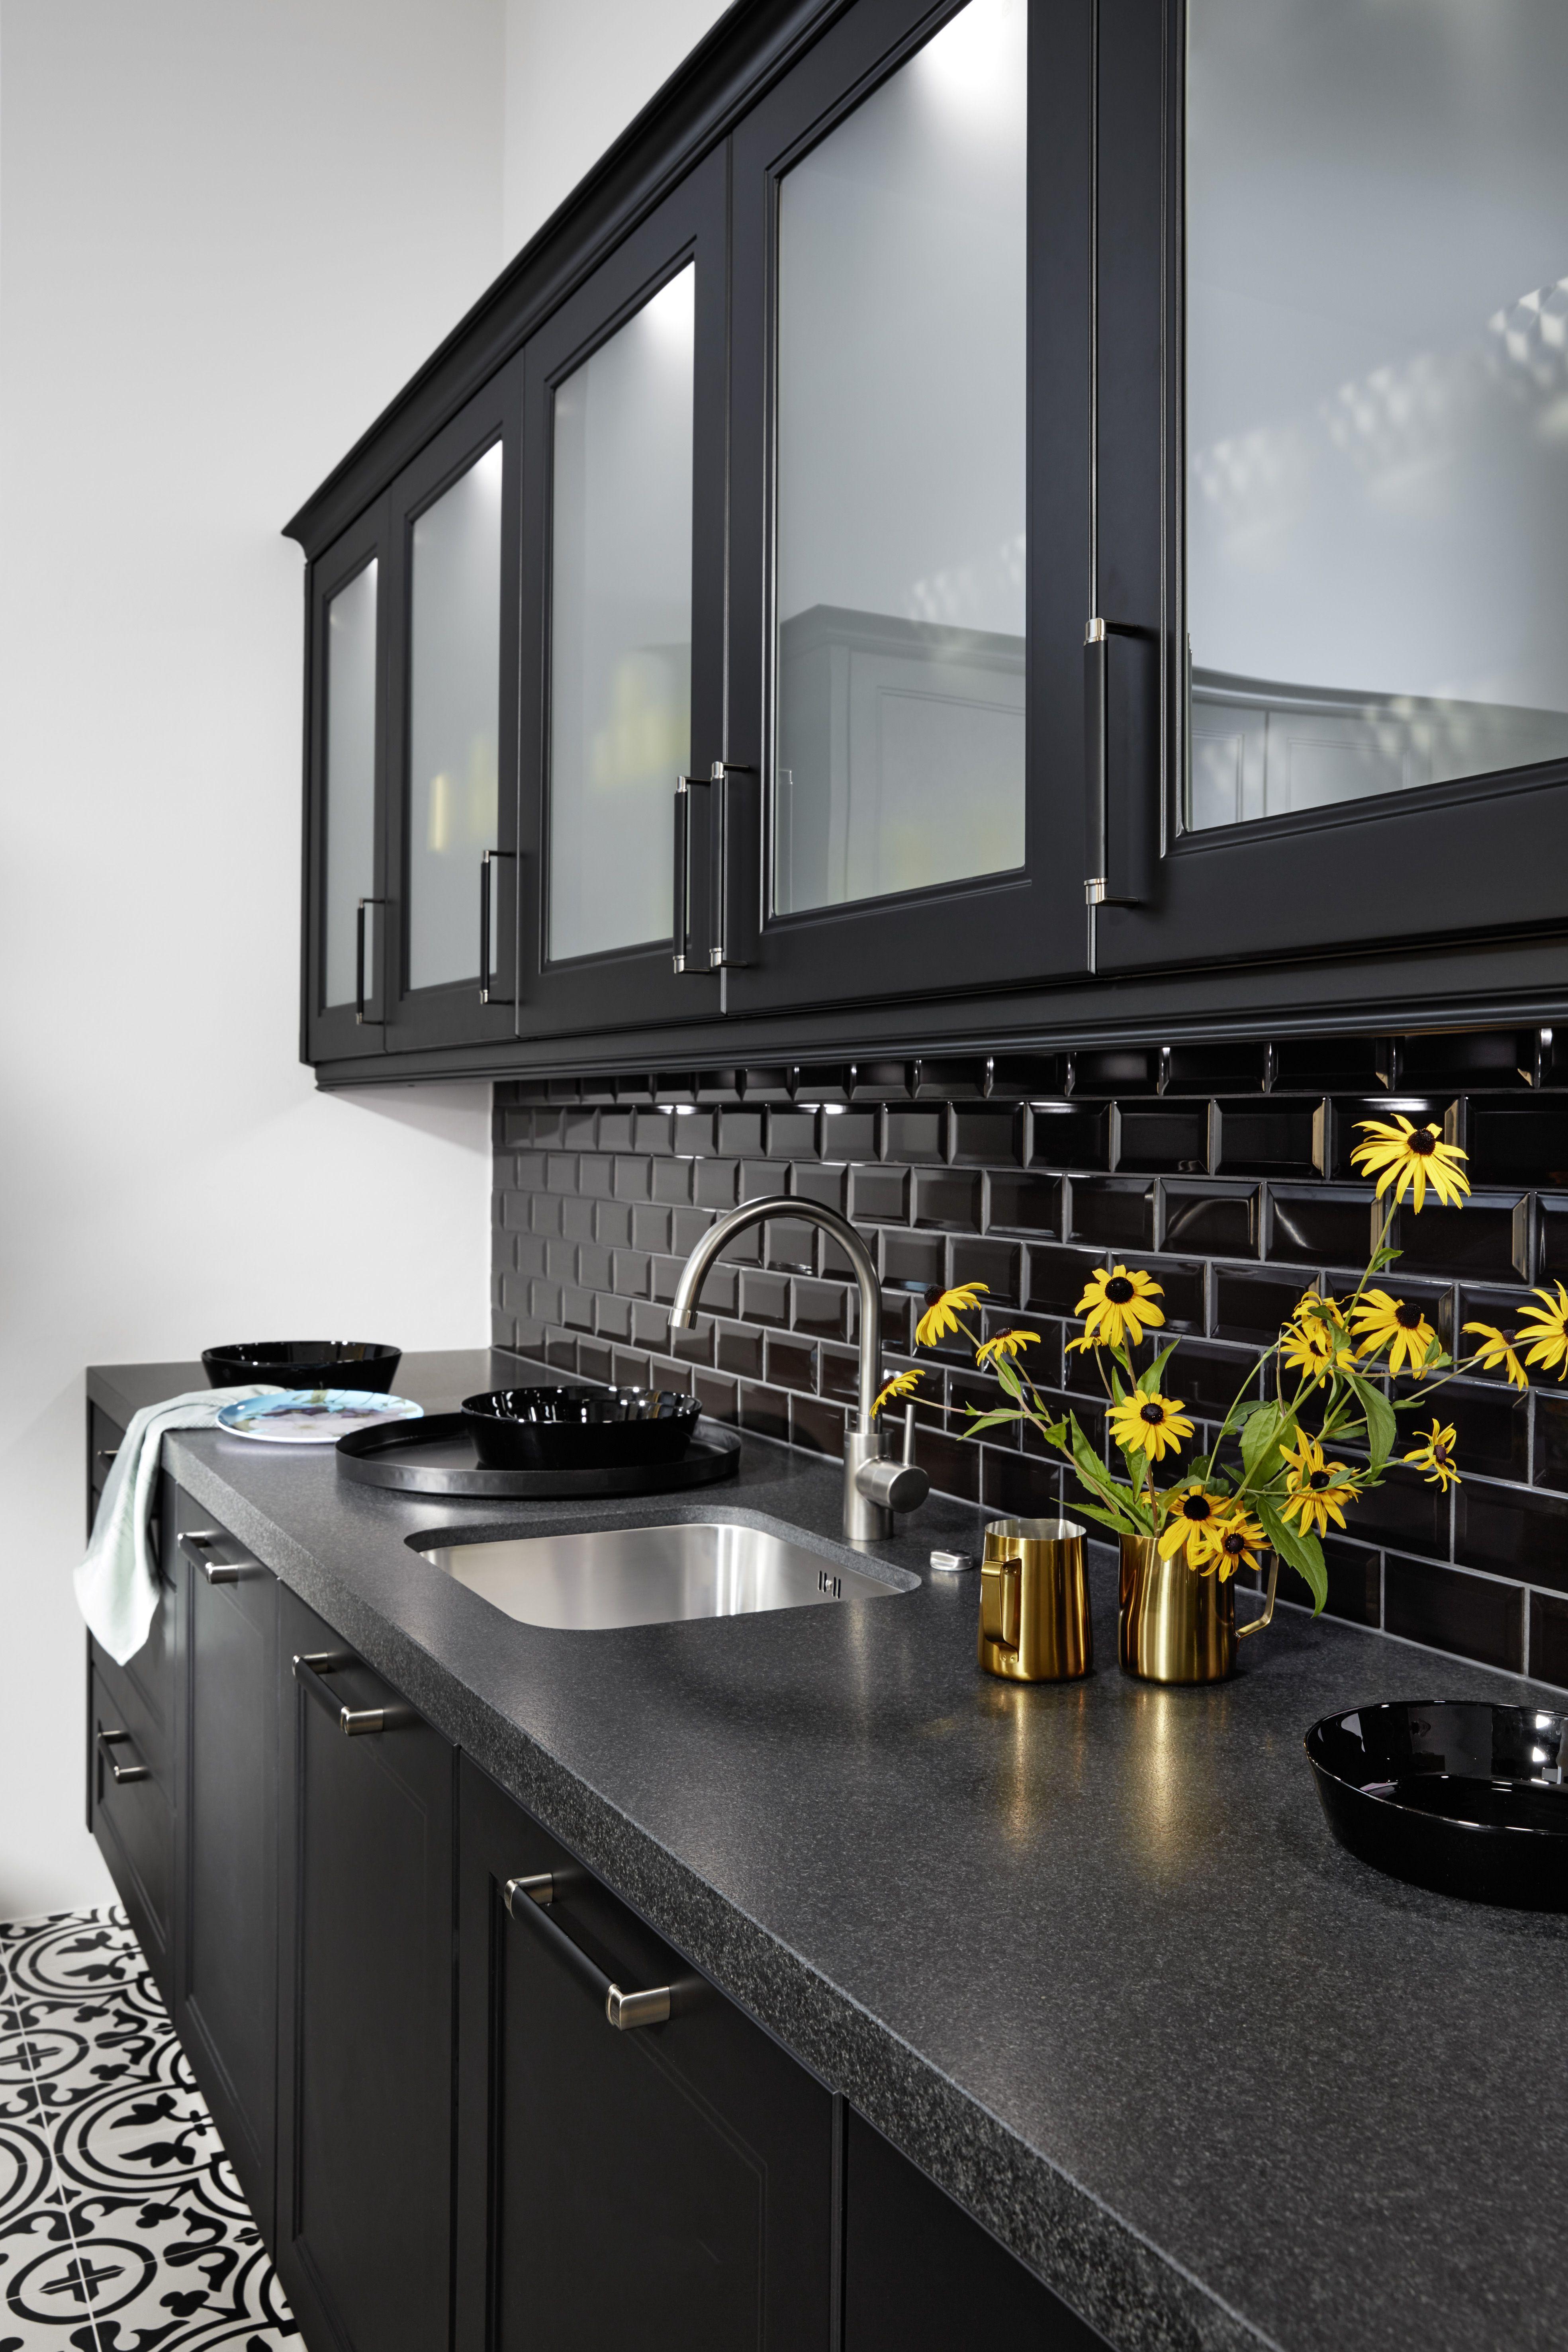 Nolte Küche Country | kreativ.hbra.online